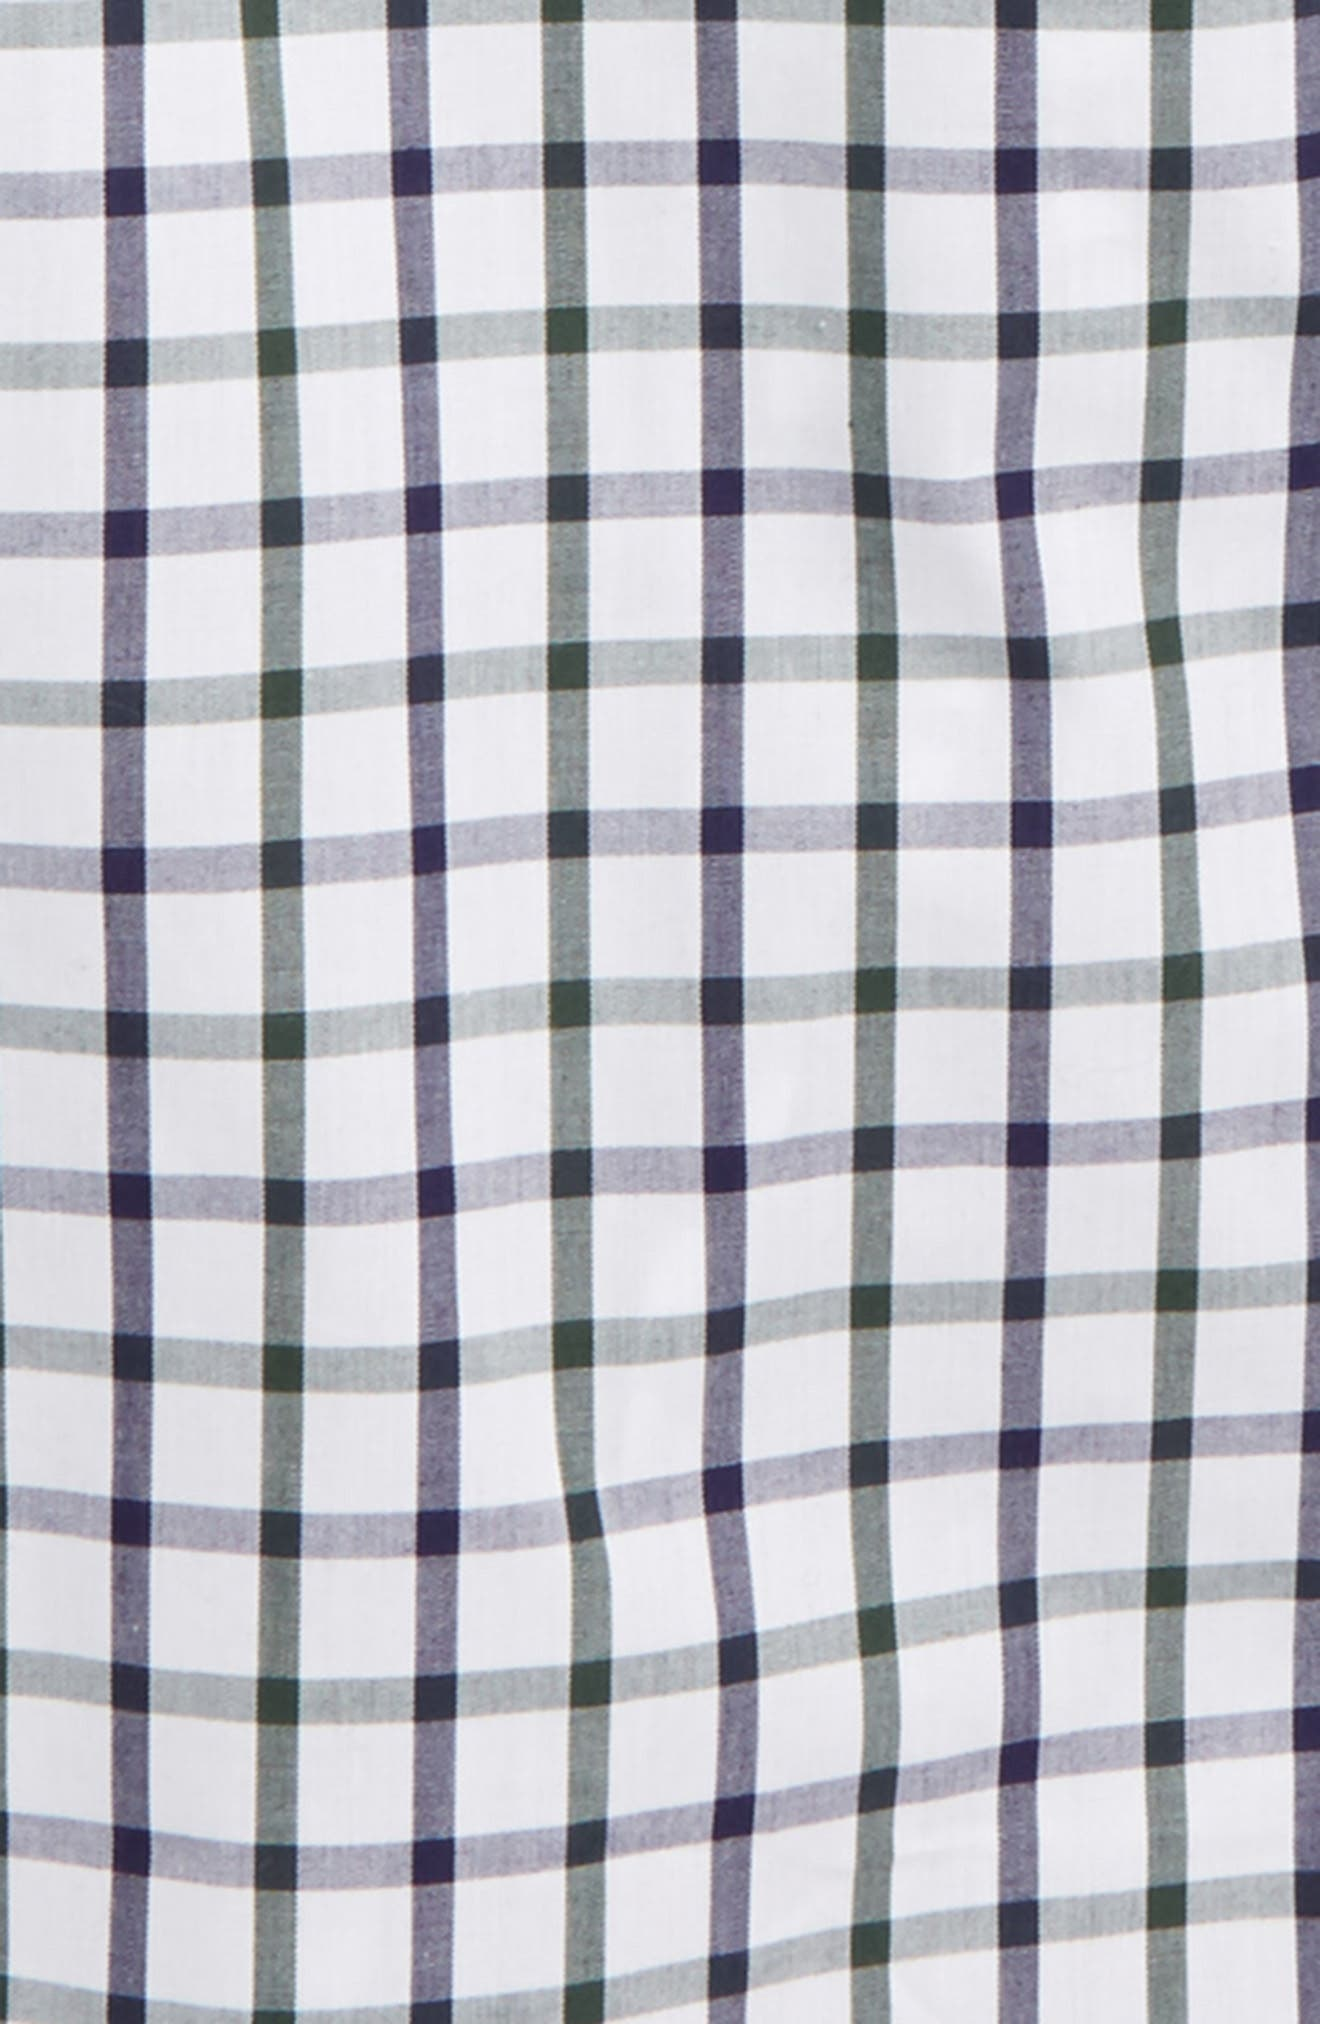 Windowpane Plaid Dress Shirt,                             Alternate thumbnail 2, color,                             White-Navy Plaid